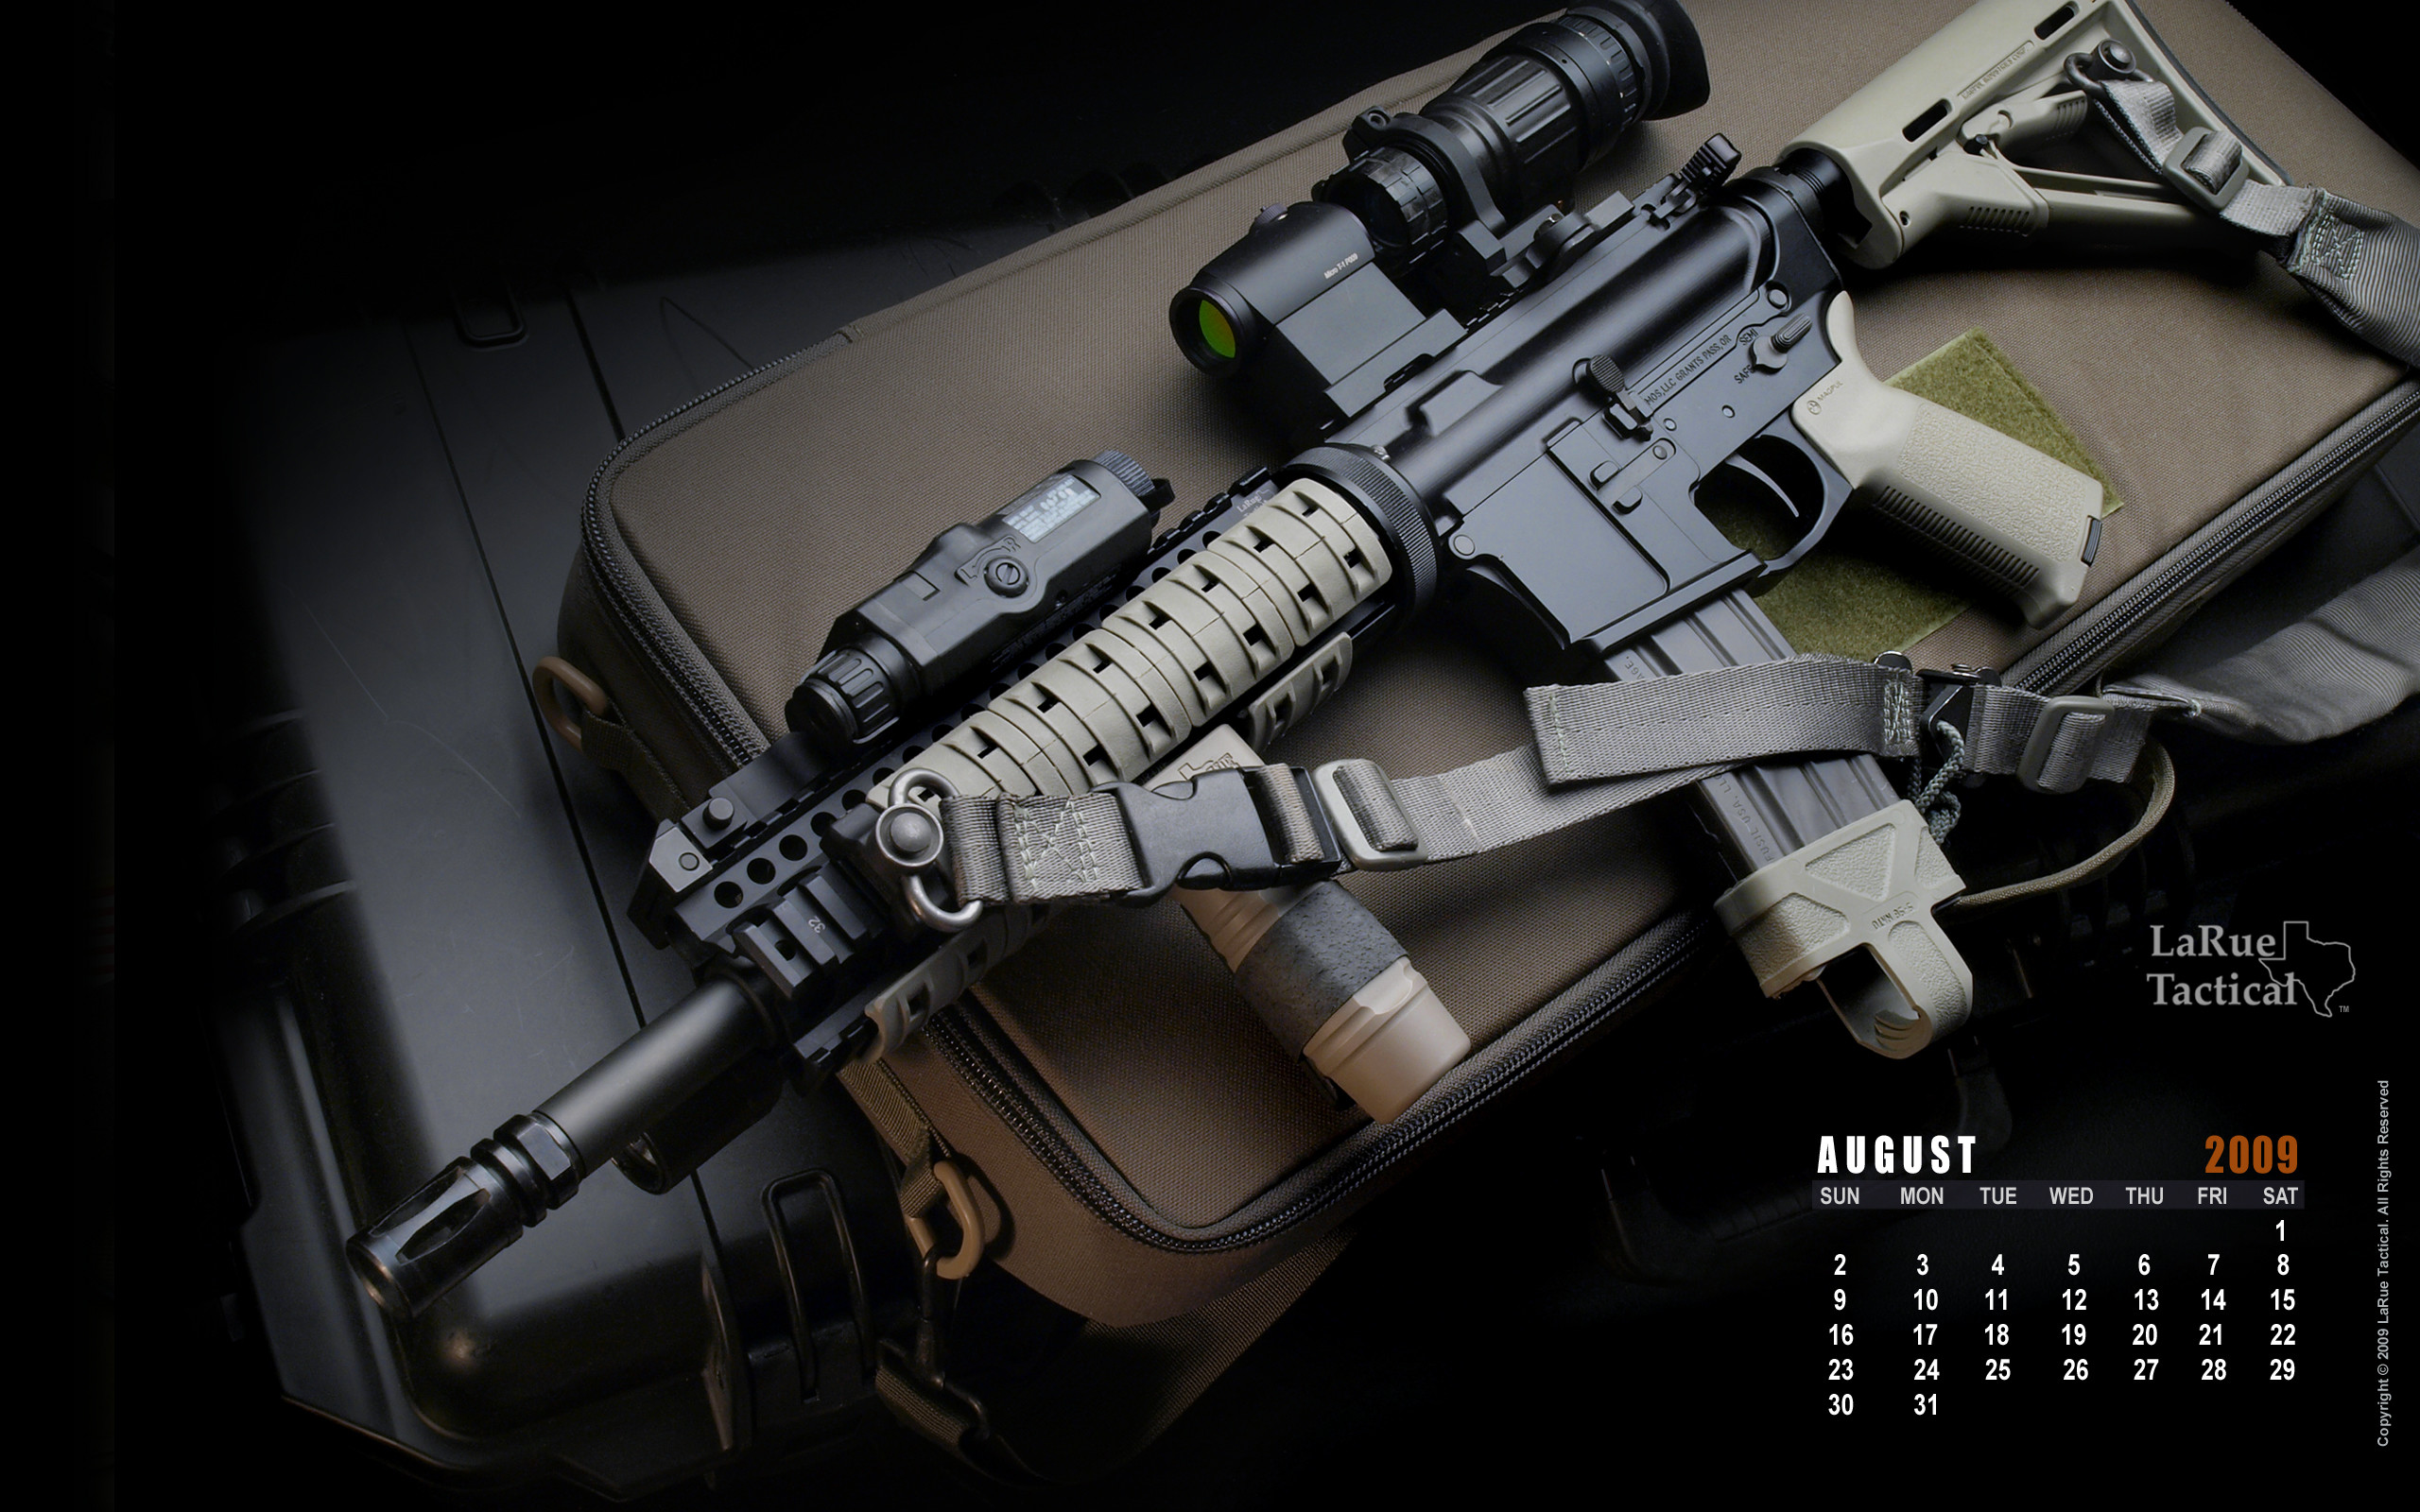 Aimpoint AR 15 Calendar Guns LaRue Tactical Weapons …